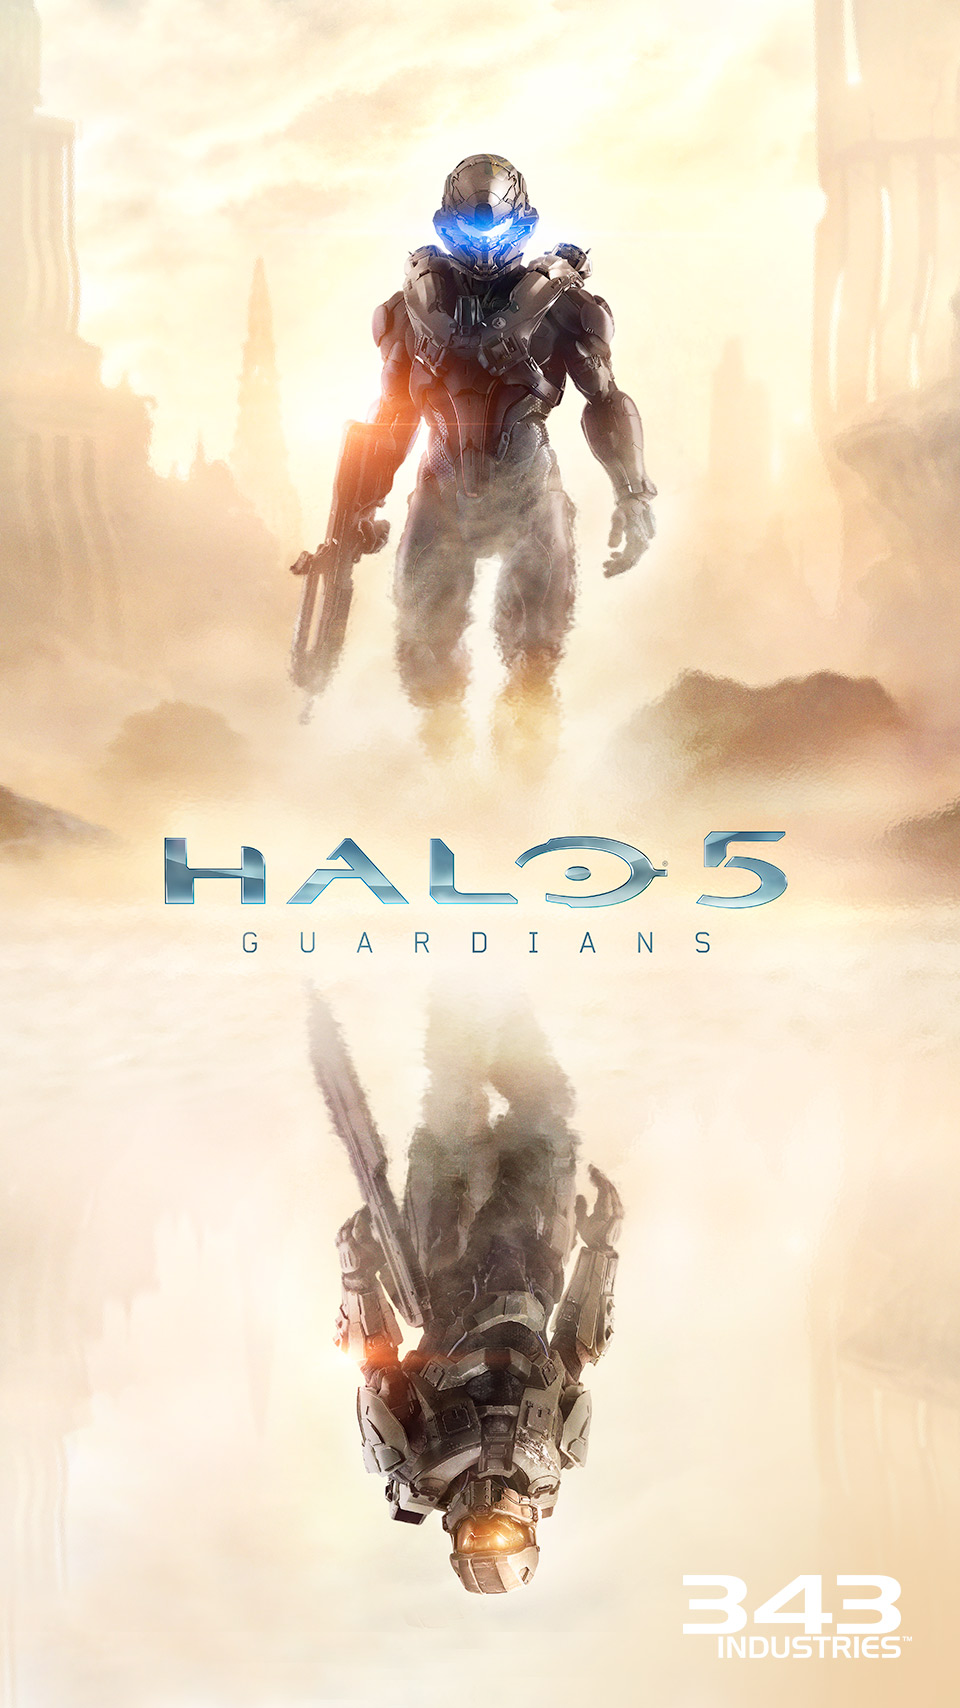 33 Halo 5 Guardians Phone Wallpaper On Wallpapersafari